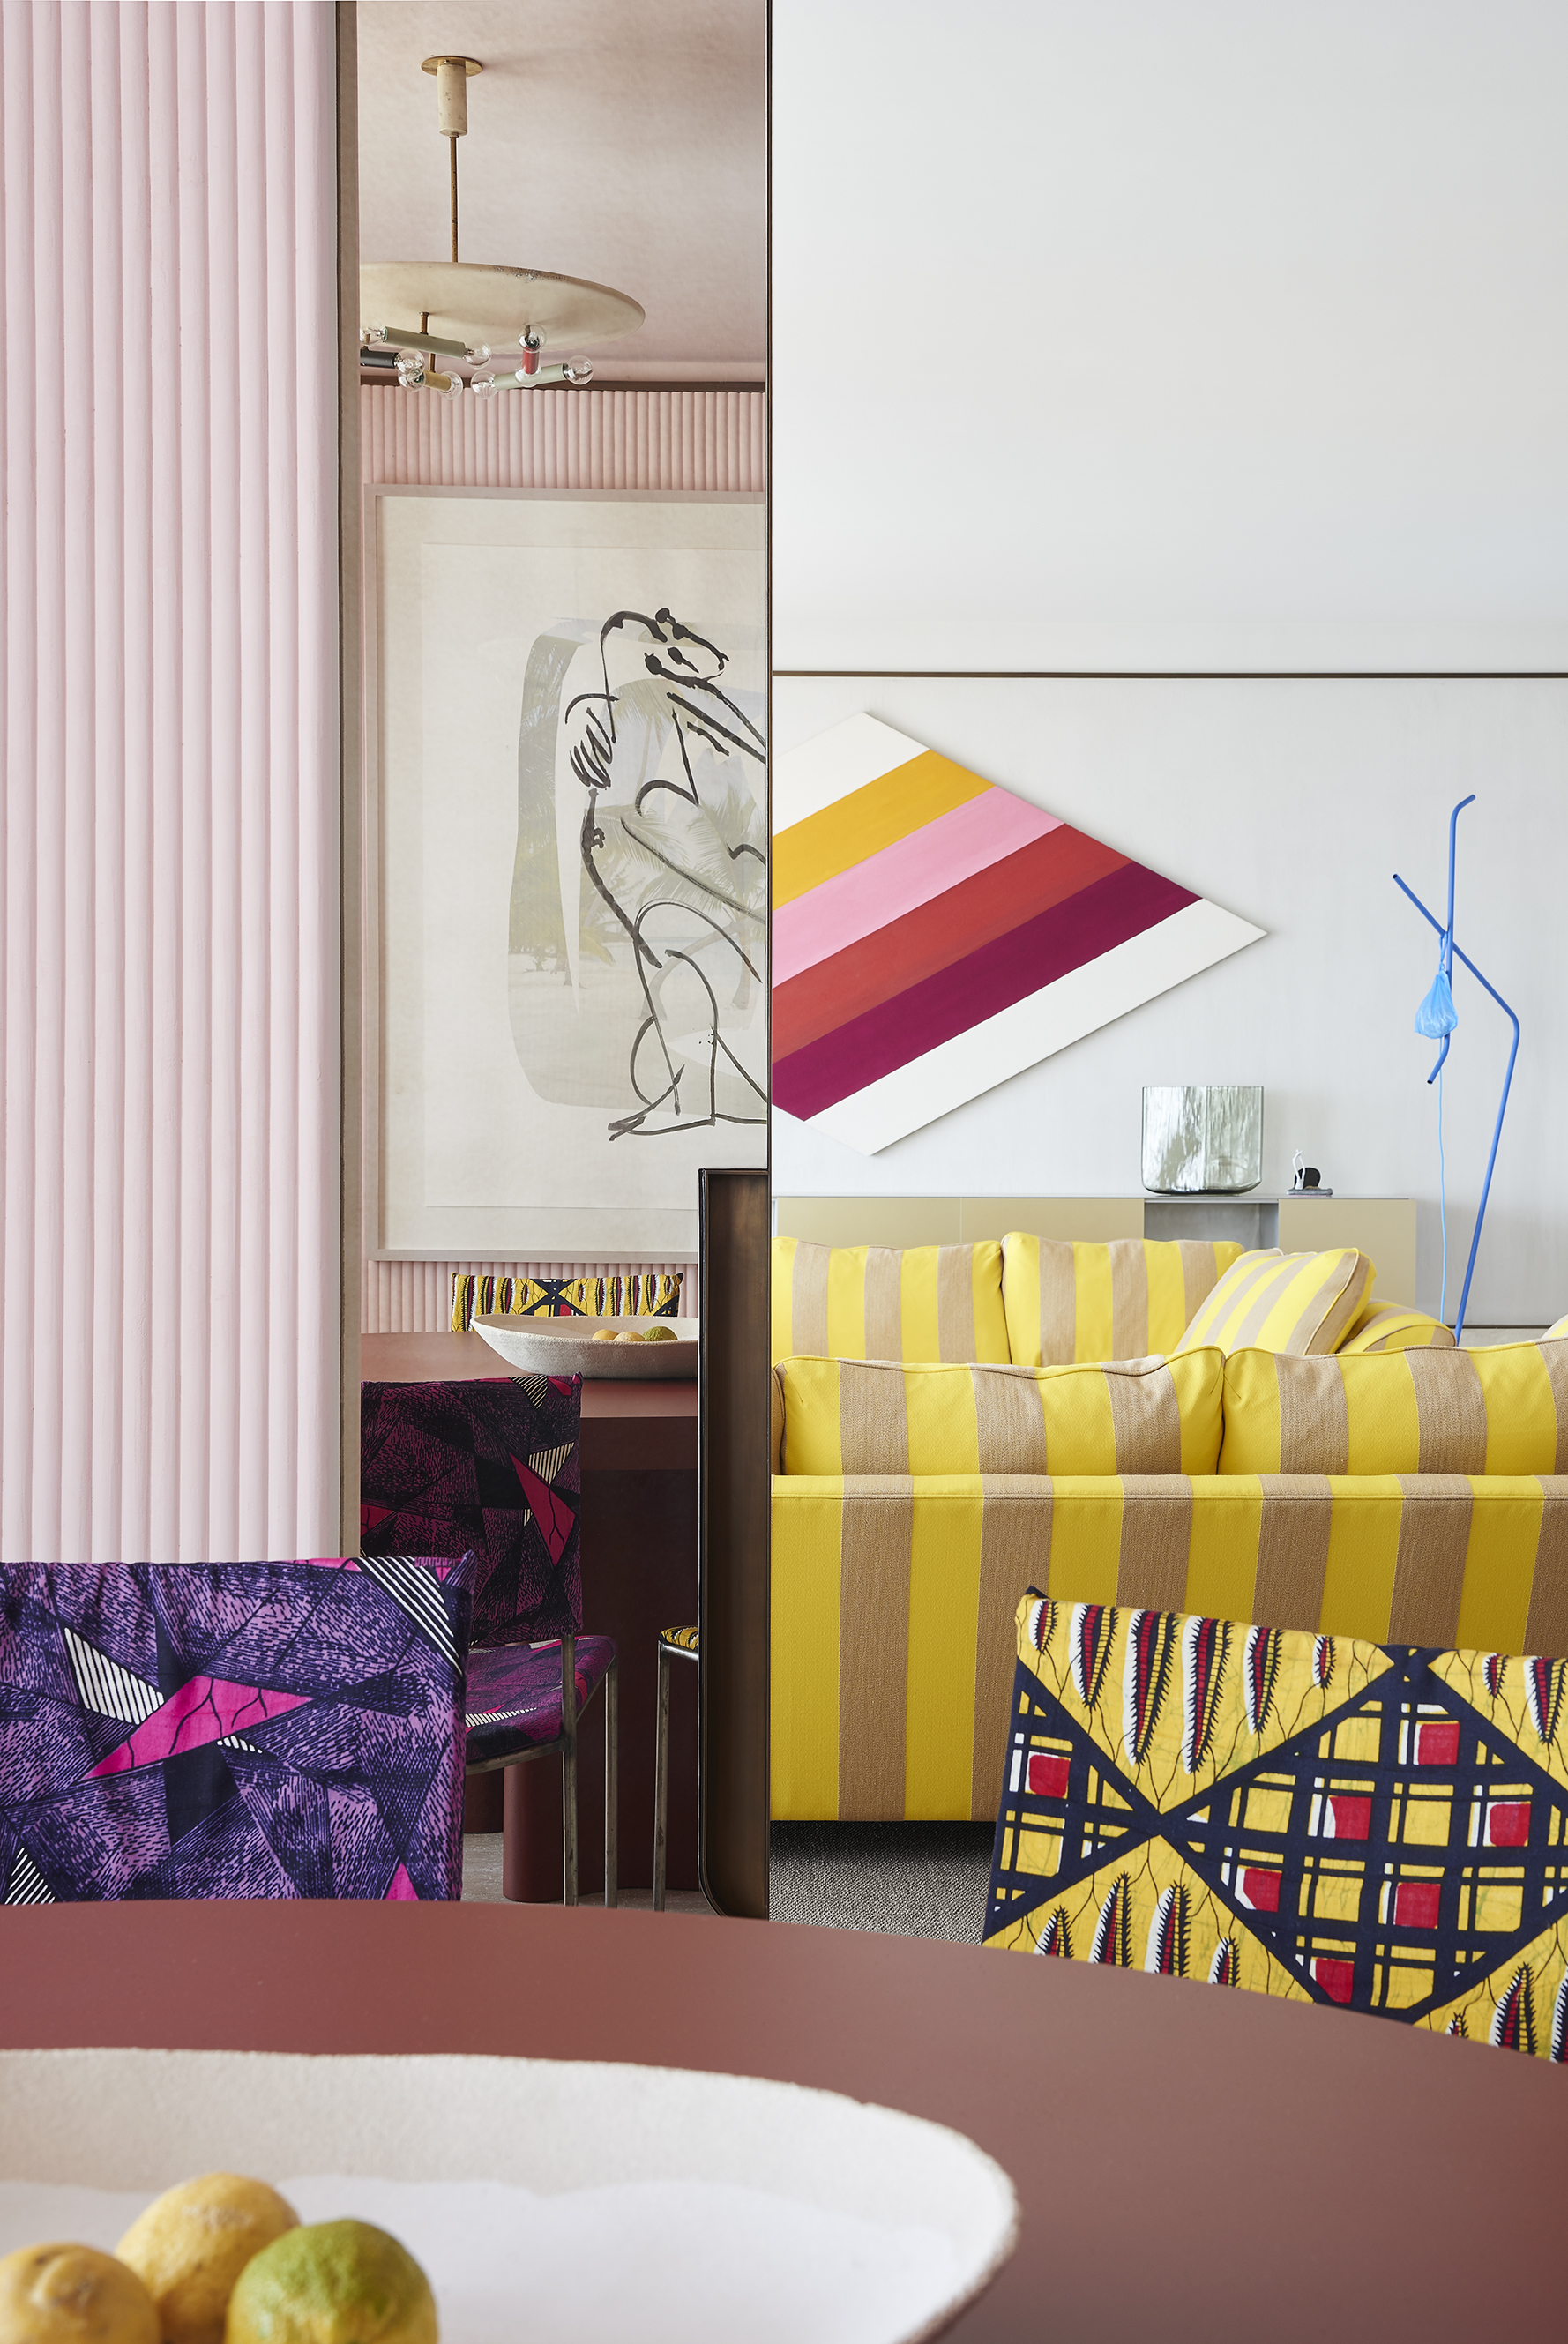 004-Rodolphe_Parente_Appartement_Sud